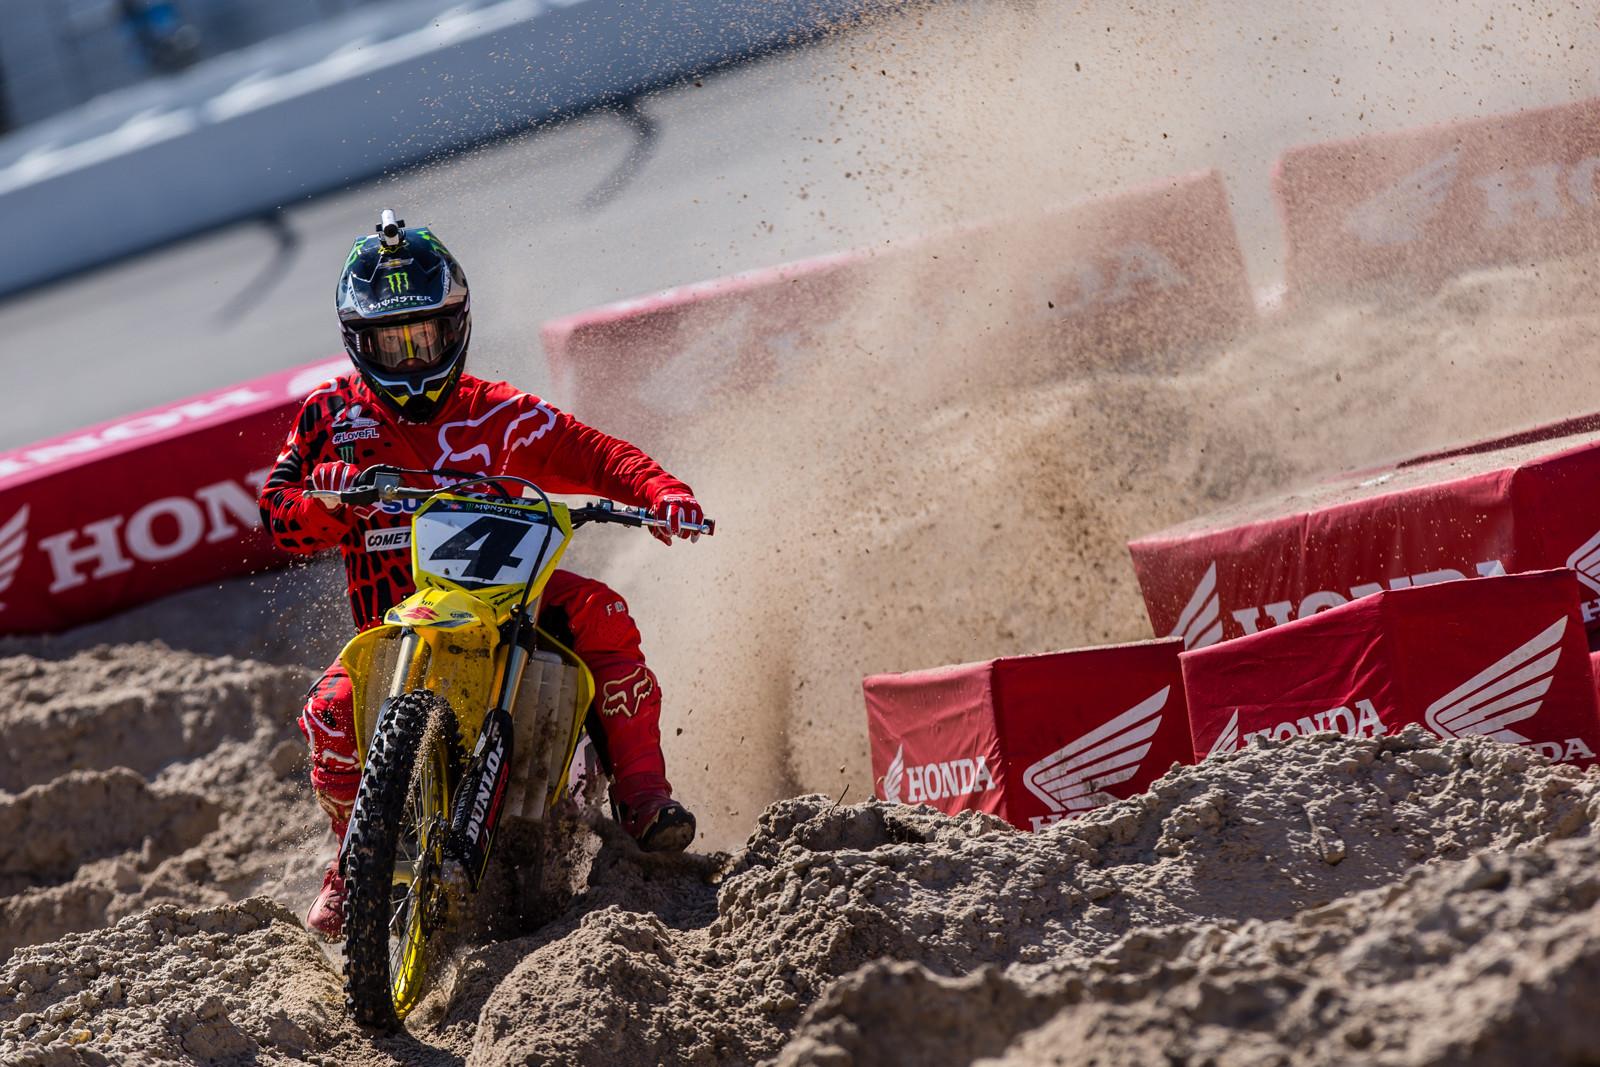 Vital MX Pit Bits: Daytona Supercross - Ricky Carmichael - Vital MX Pit Bits: Daytona Supercross - Motocross Pictures - Vital MX